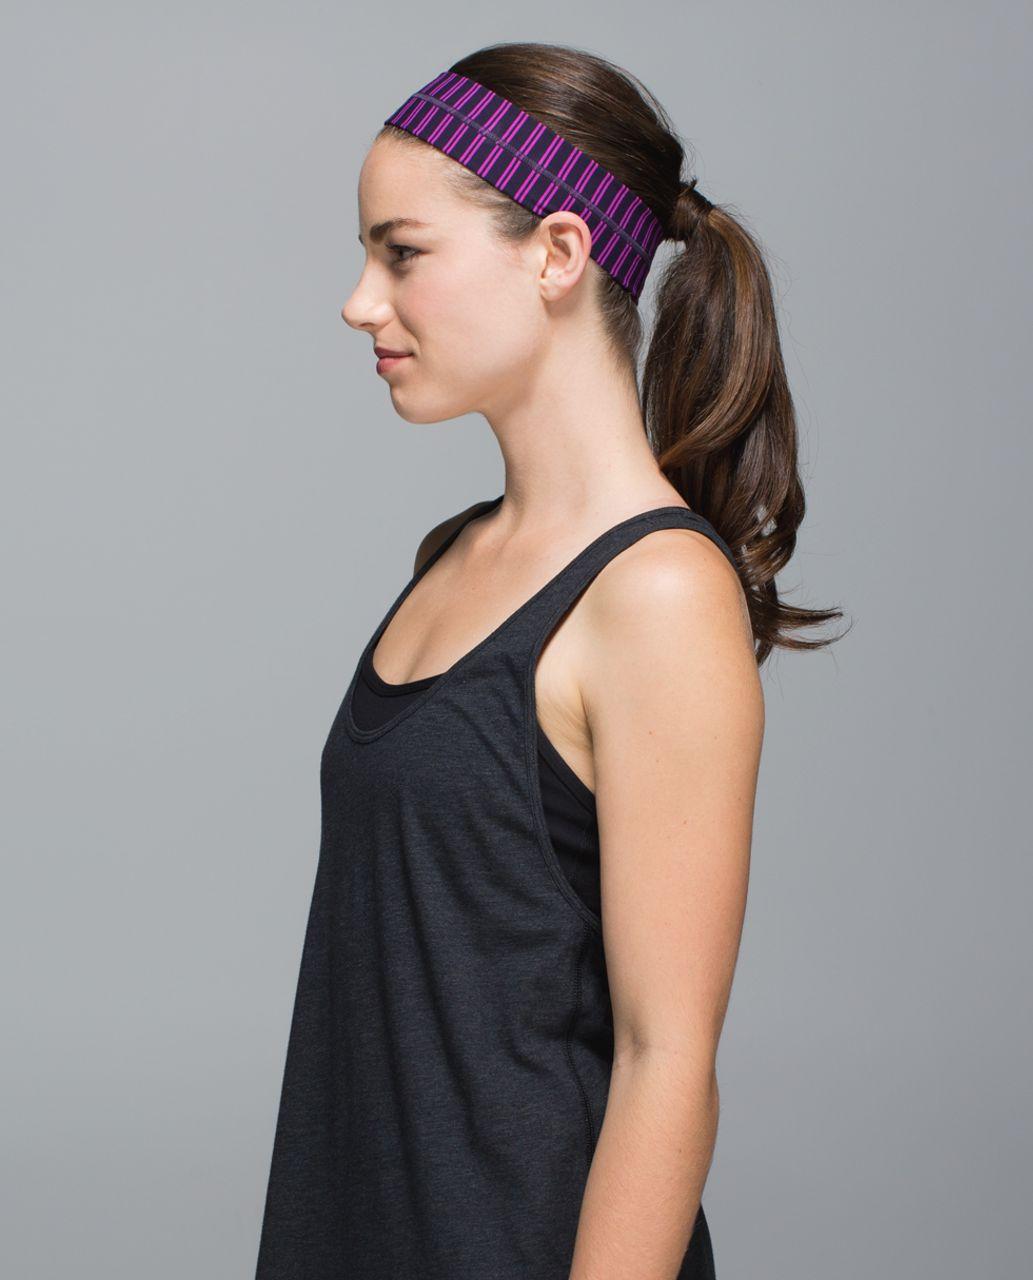 Lululemon Fly Away Tamer Headband - Double Trouble Stripe Ultra Violet Black Grape